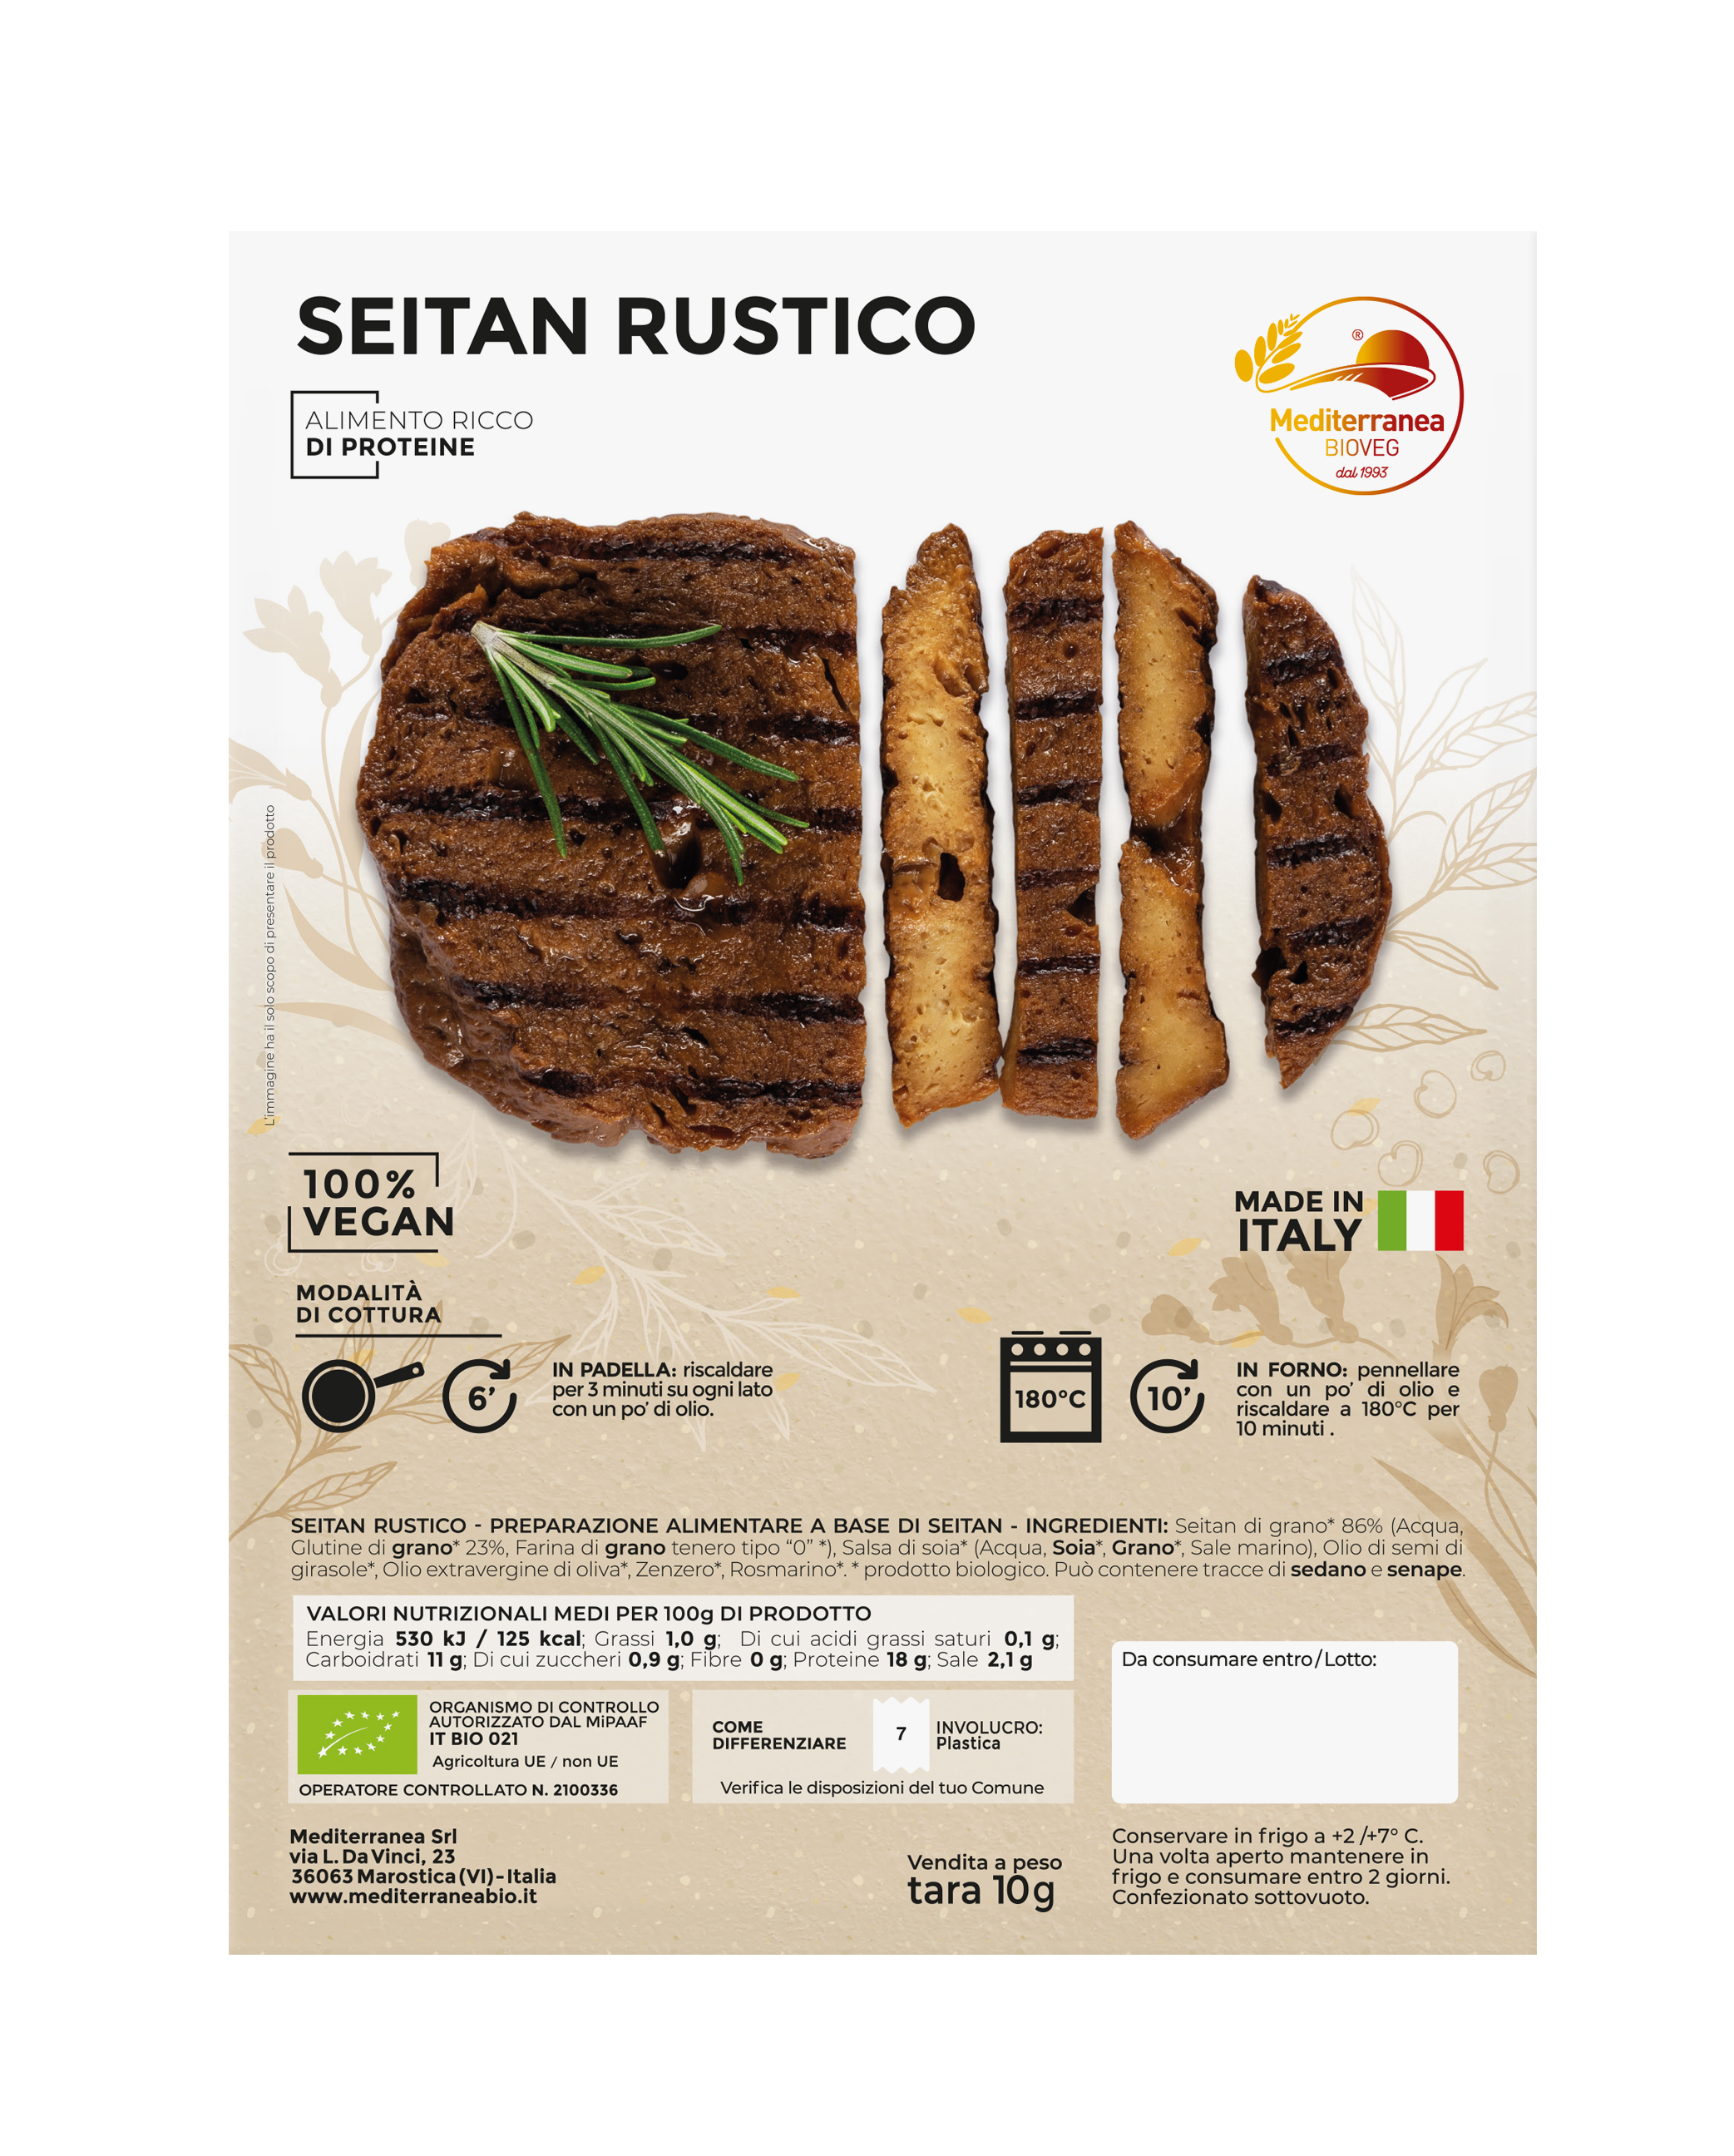 Seitan rustico